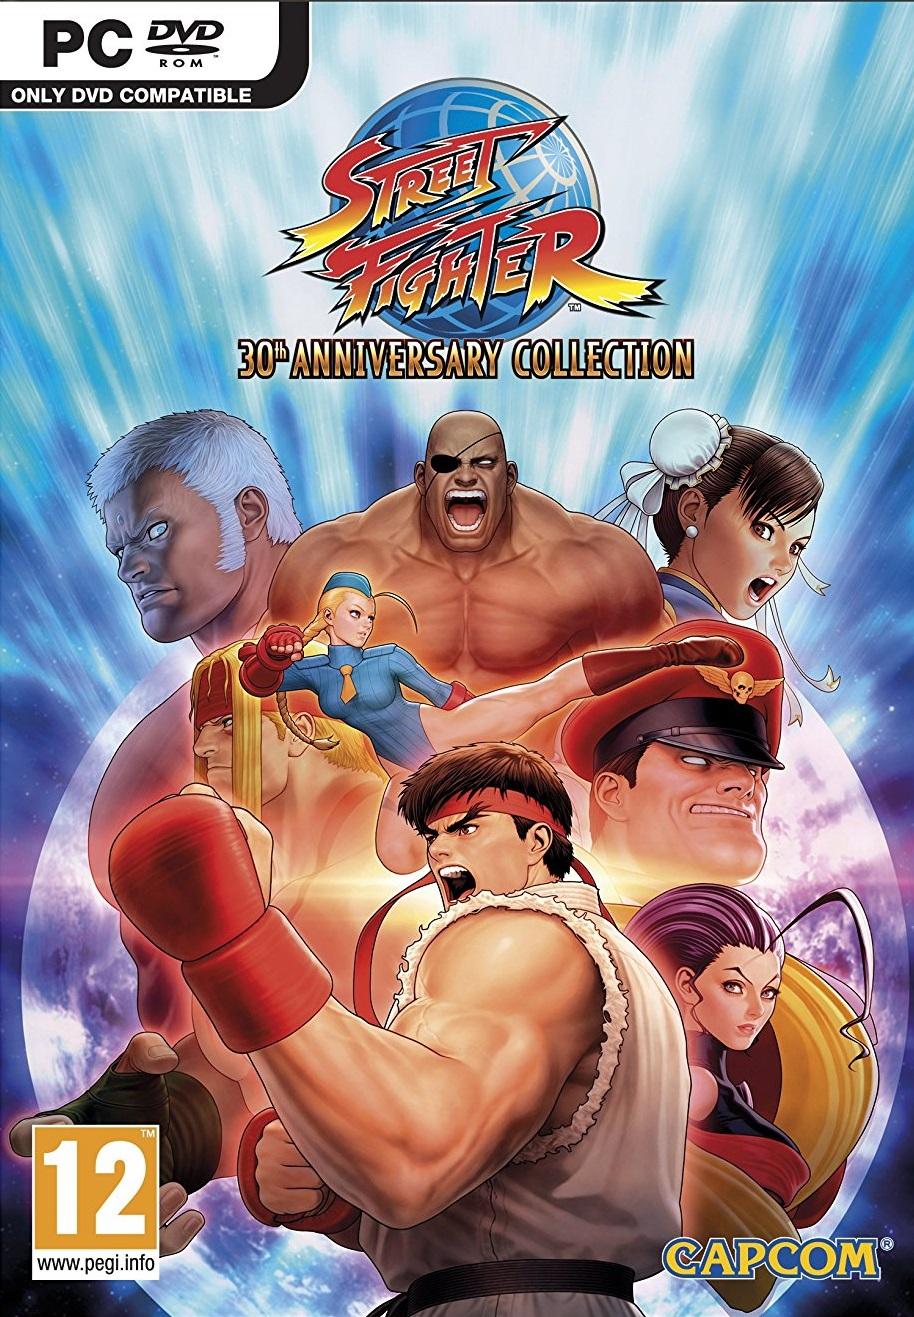 Descargar Street Fighter 30th Anniversary CollectionESPAÑOL MEGA